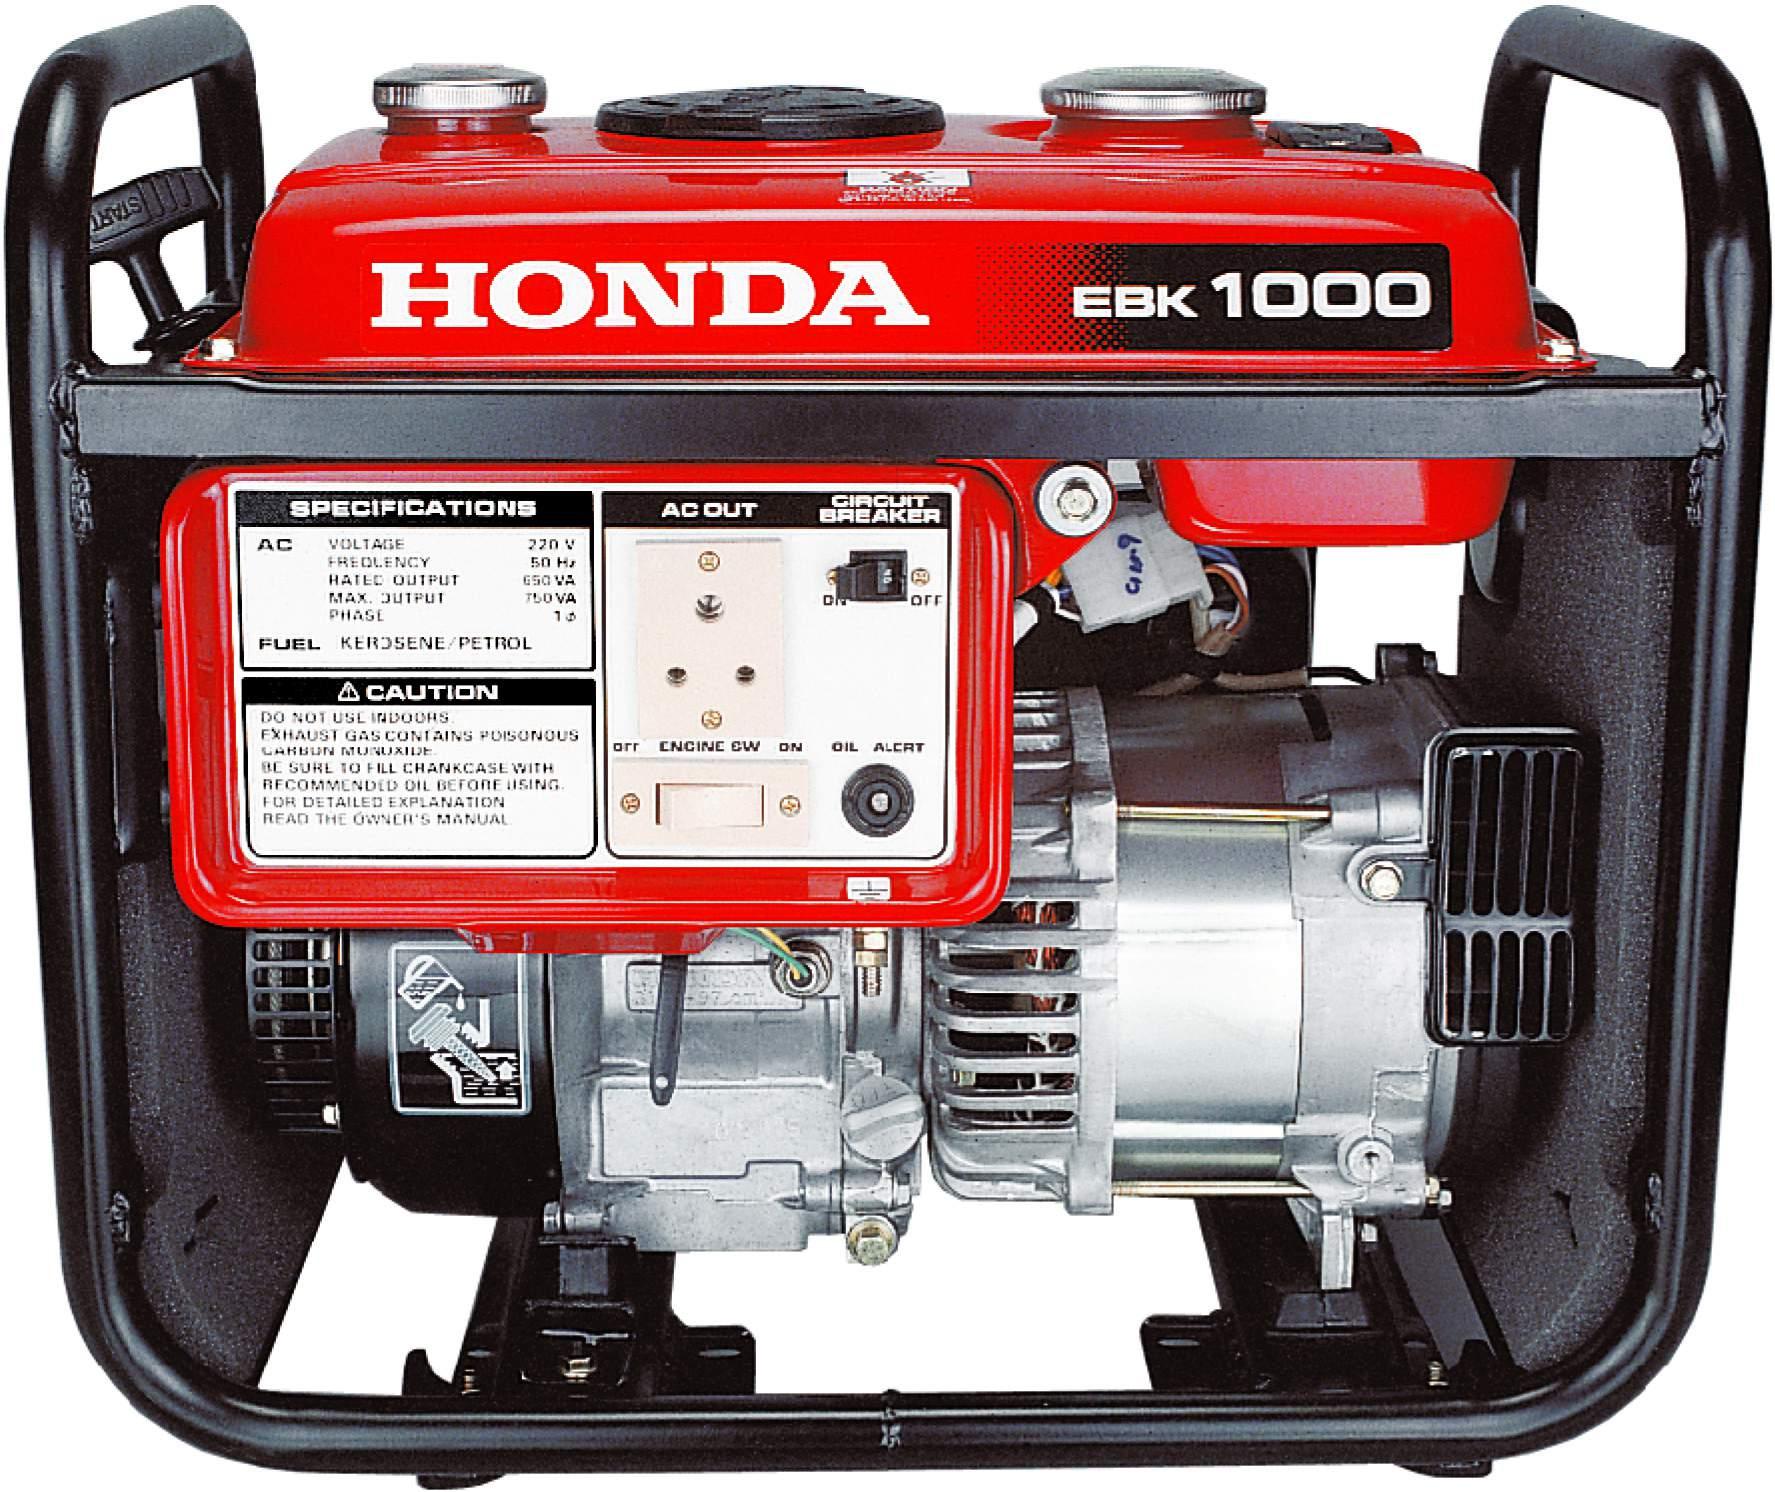 Honda Portable Gensets EBK1000 Image